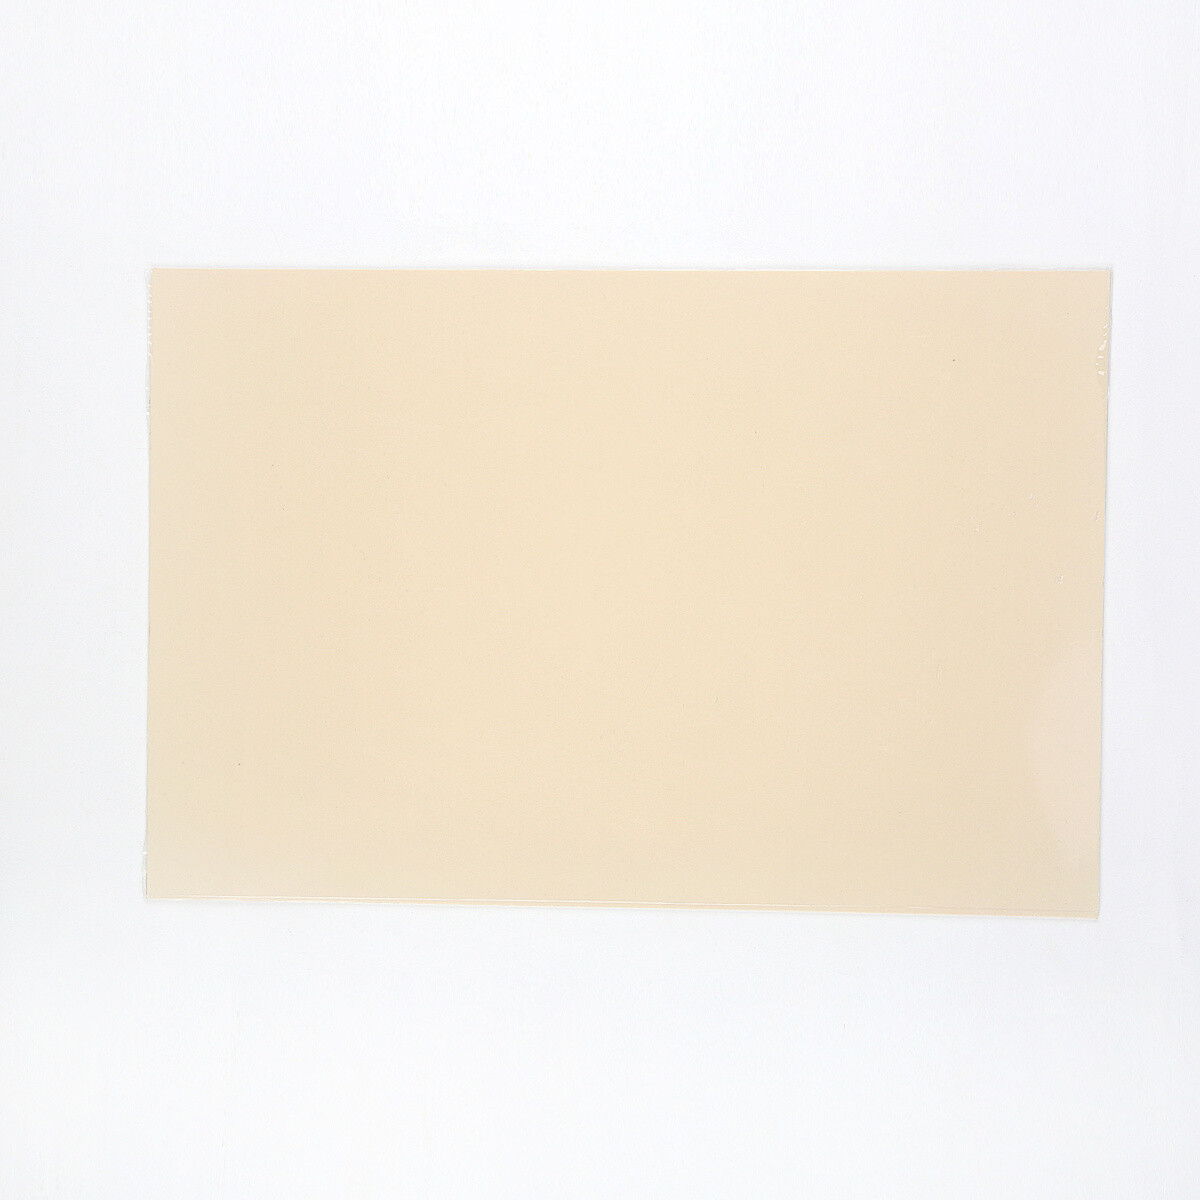 "Brio Pickguard Blanks 12"" x 17"" 3 Ply Cream"